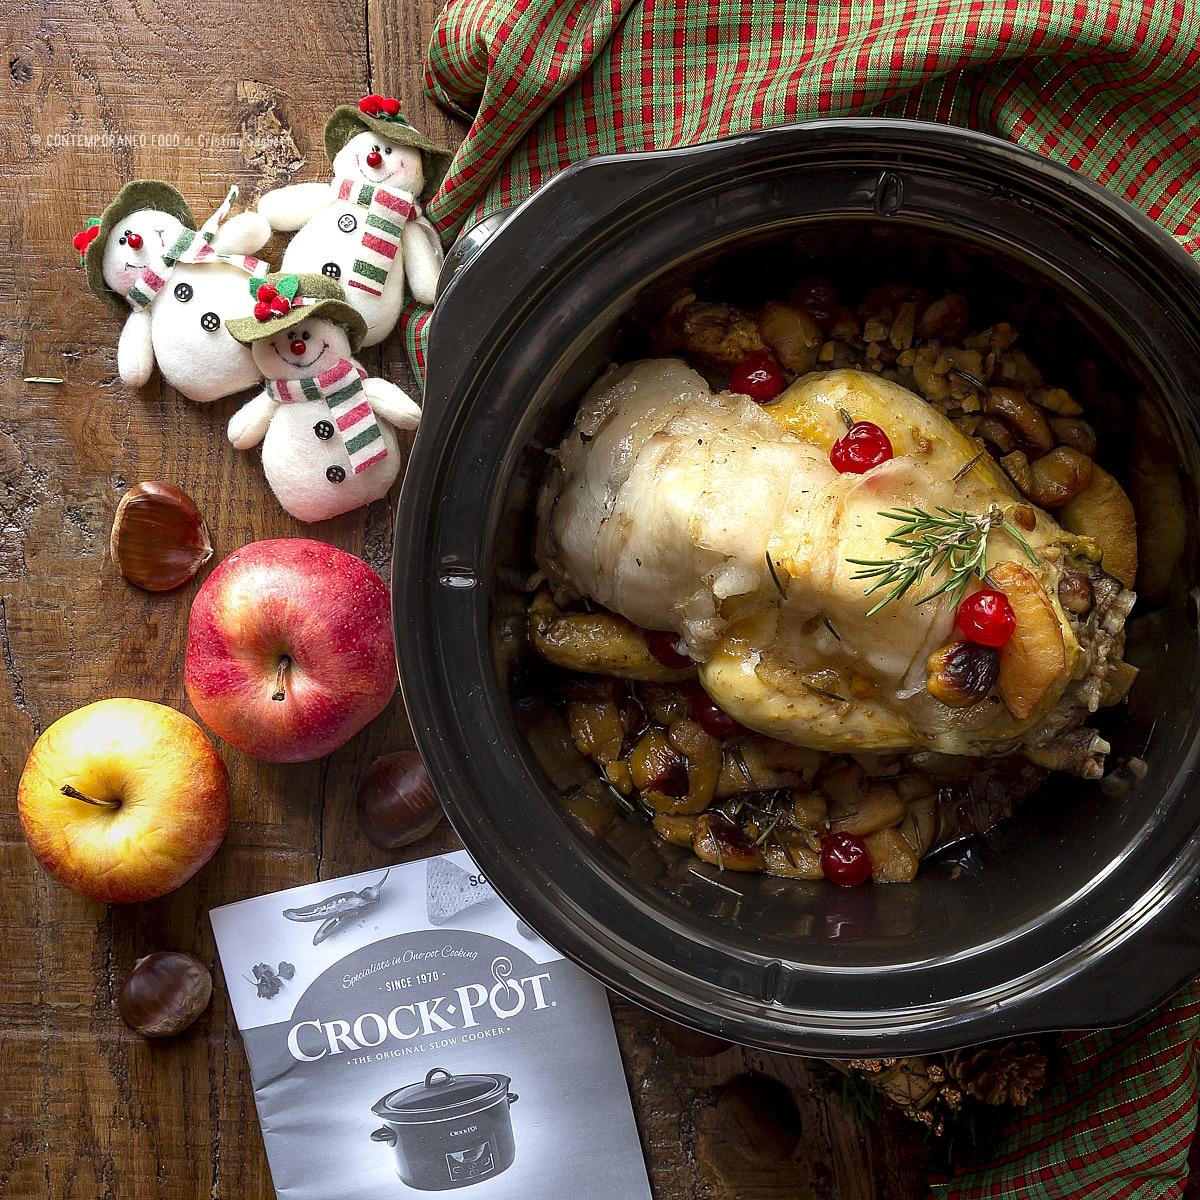 crock-pot-contemporaneo-food-faraona-ripiena-mele-castagne-ricetta-natale-influencer-torino